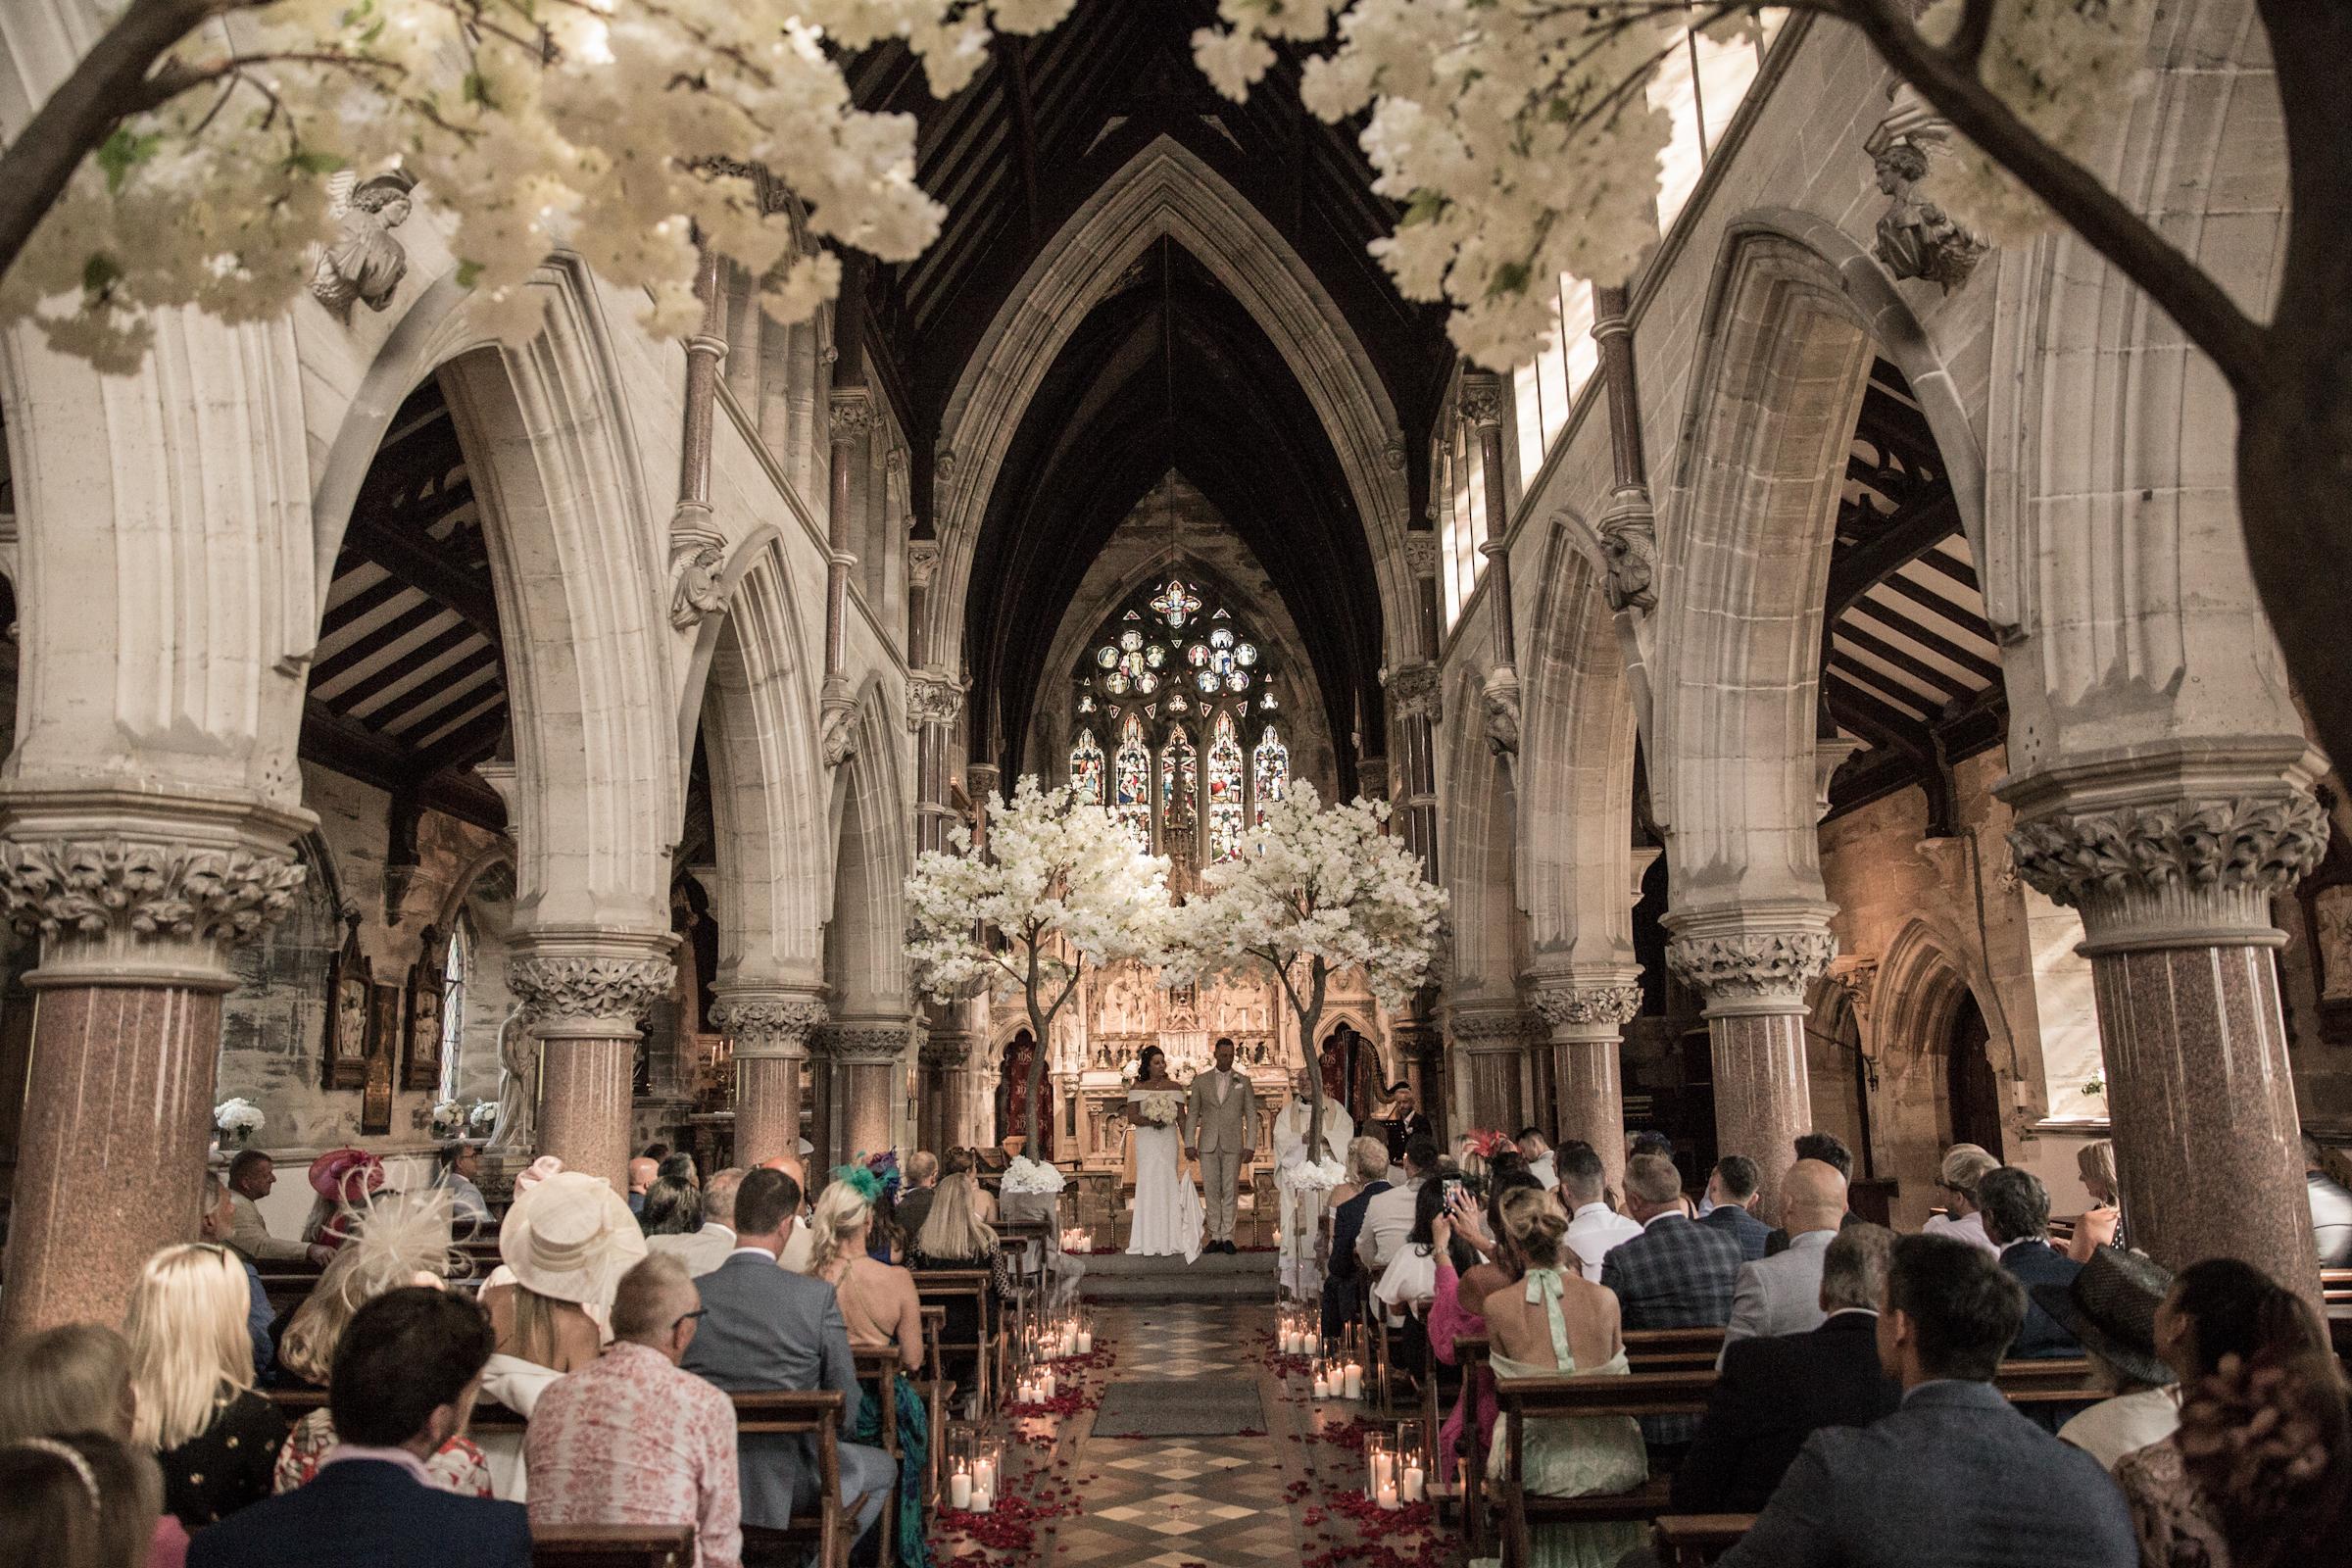 Rudding Park Real Wedding: Vanessa and Jason's Epic Wedding Party